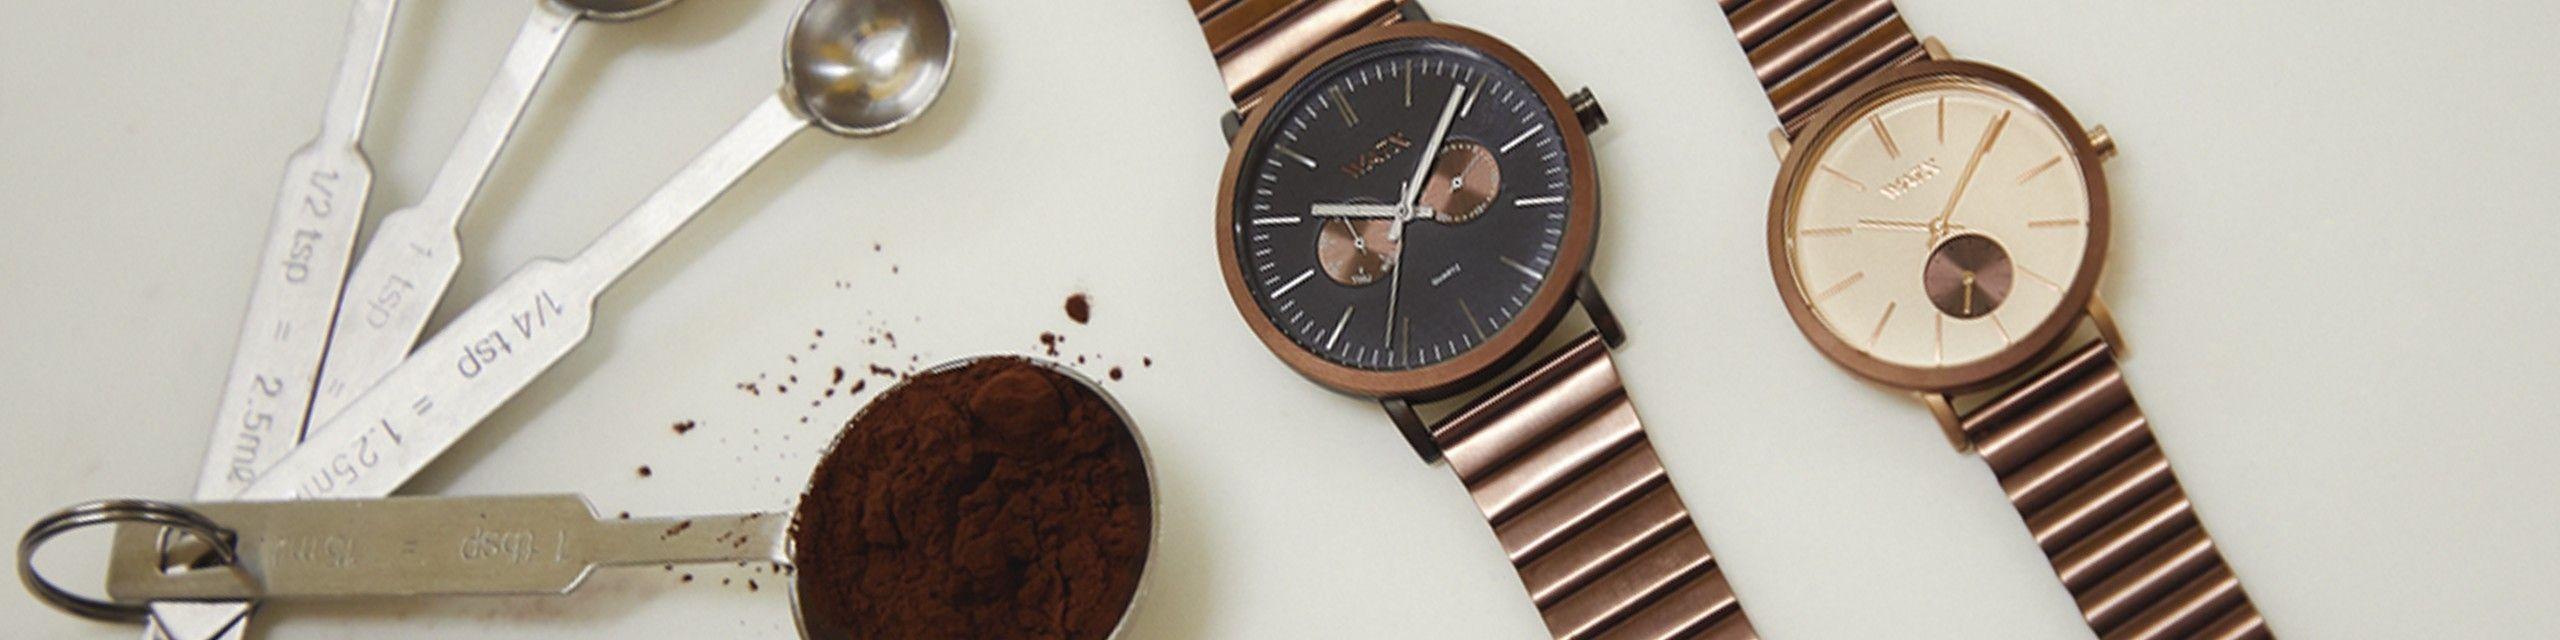 Braceletes de relógio elegantes - Watx Portugal